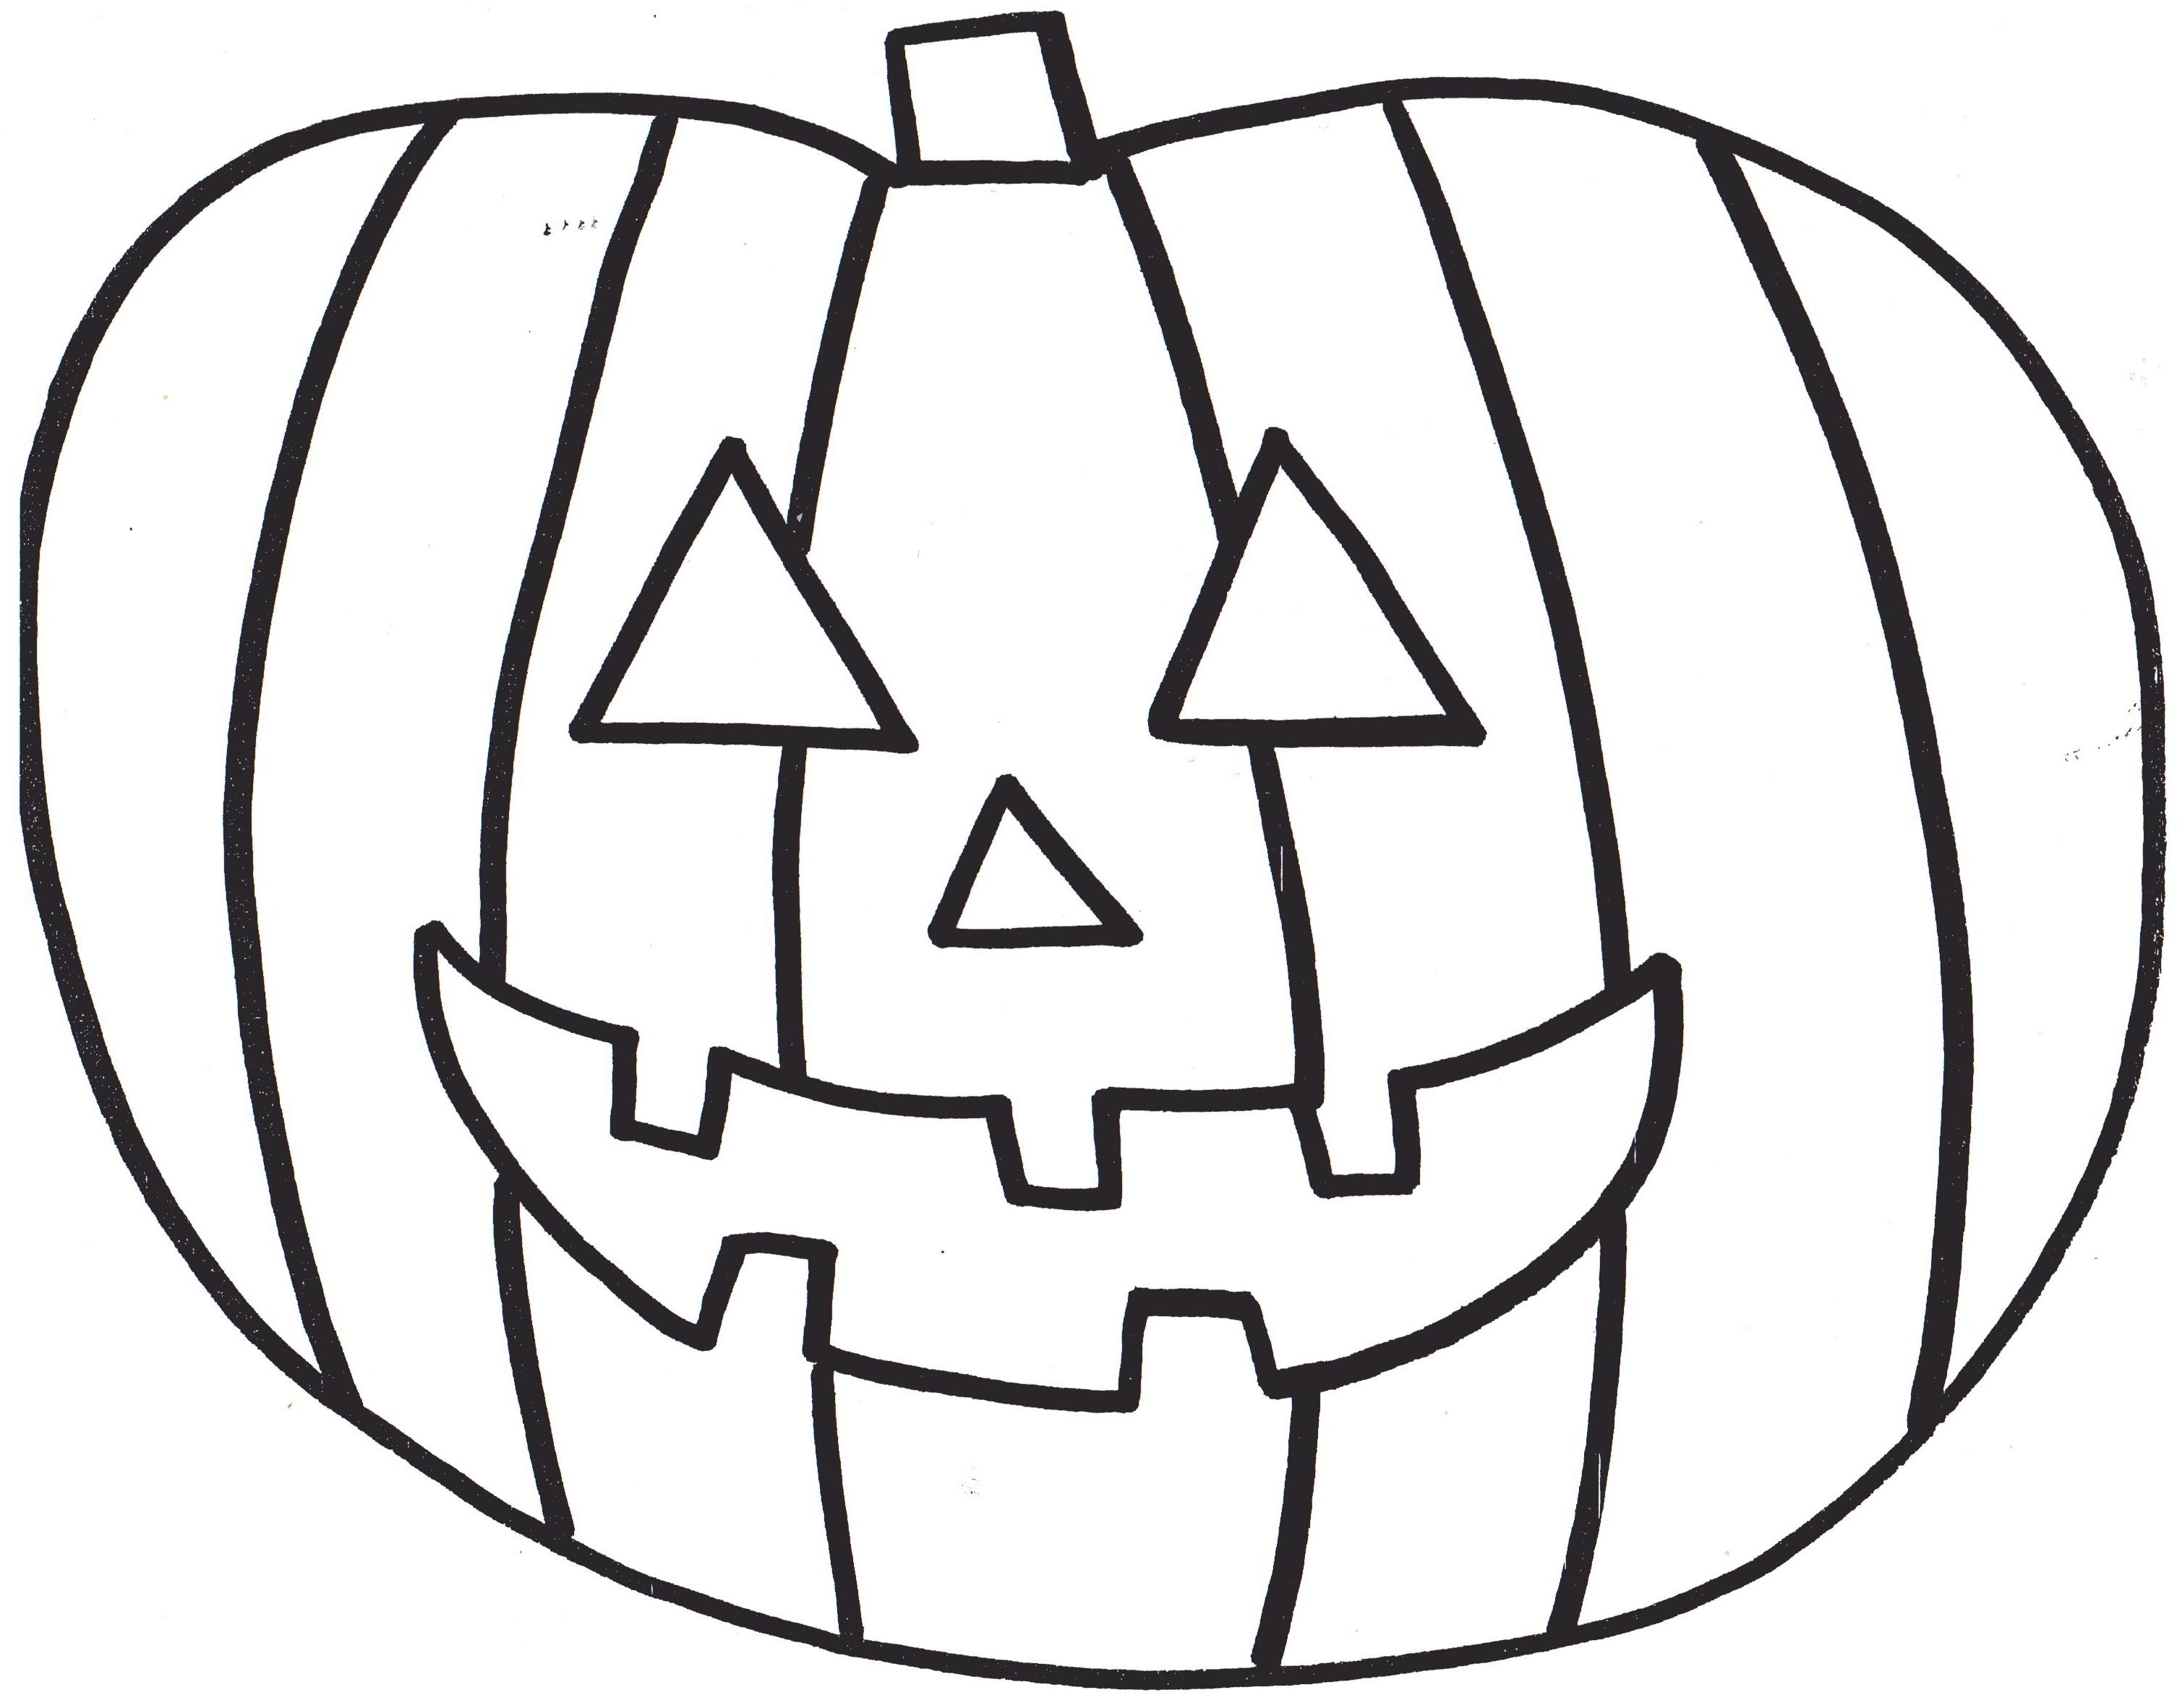 3011x2363 Pumpkins Coloring Pages For Preschool Free Printable Pumpkin Kids